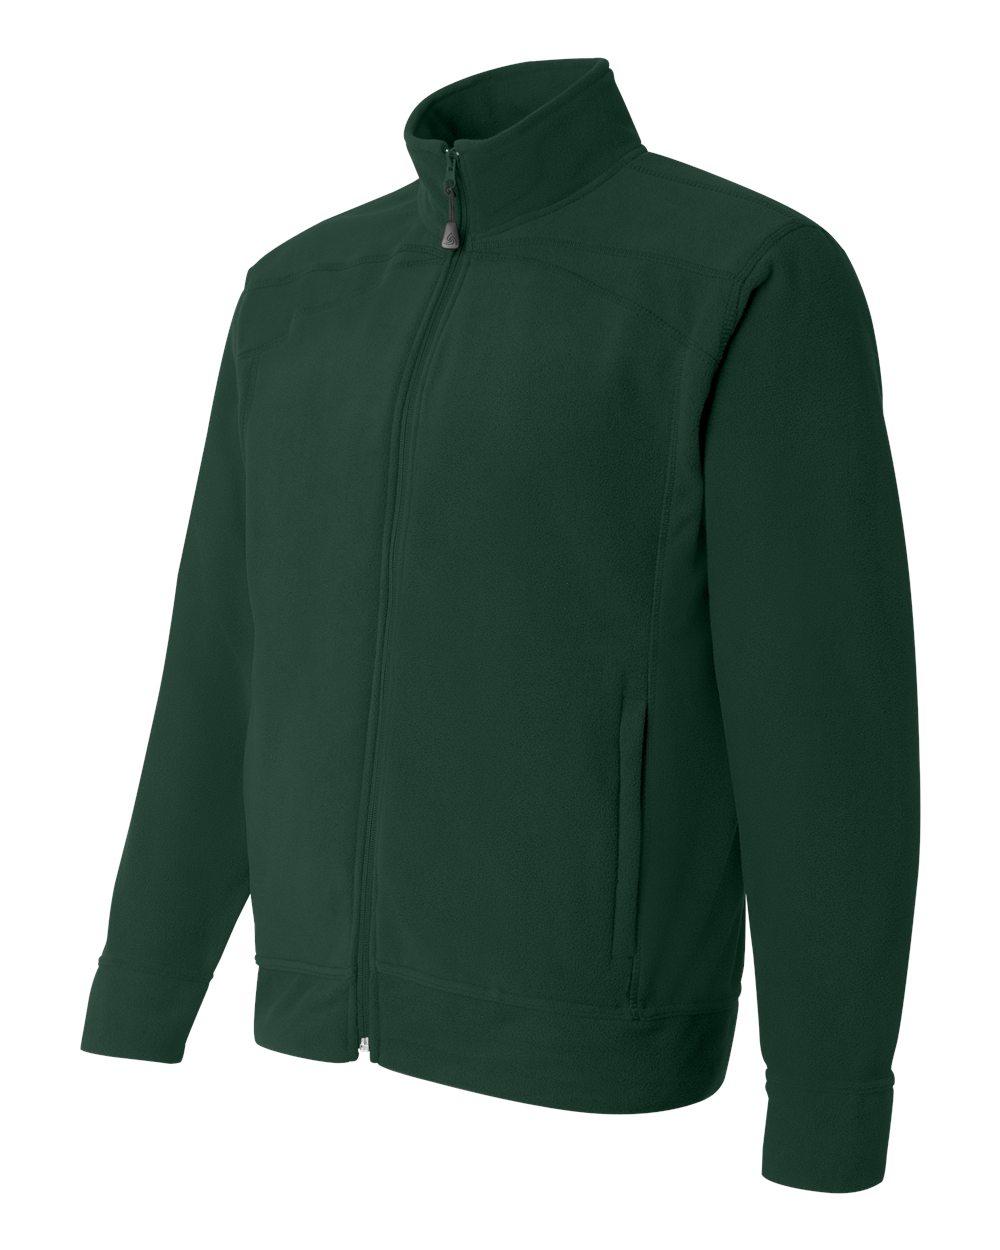 Colorado Clothing 5289 - Lightweight Microfleece Full-Zip Jacket